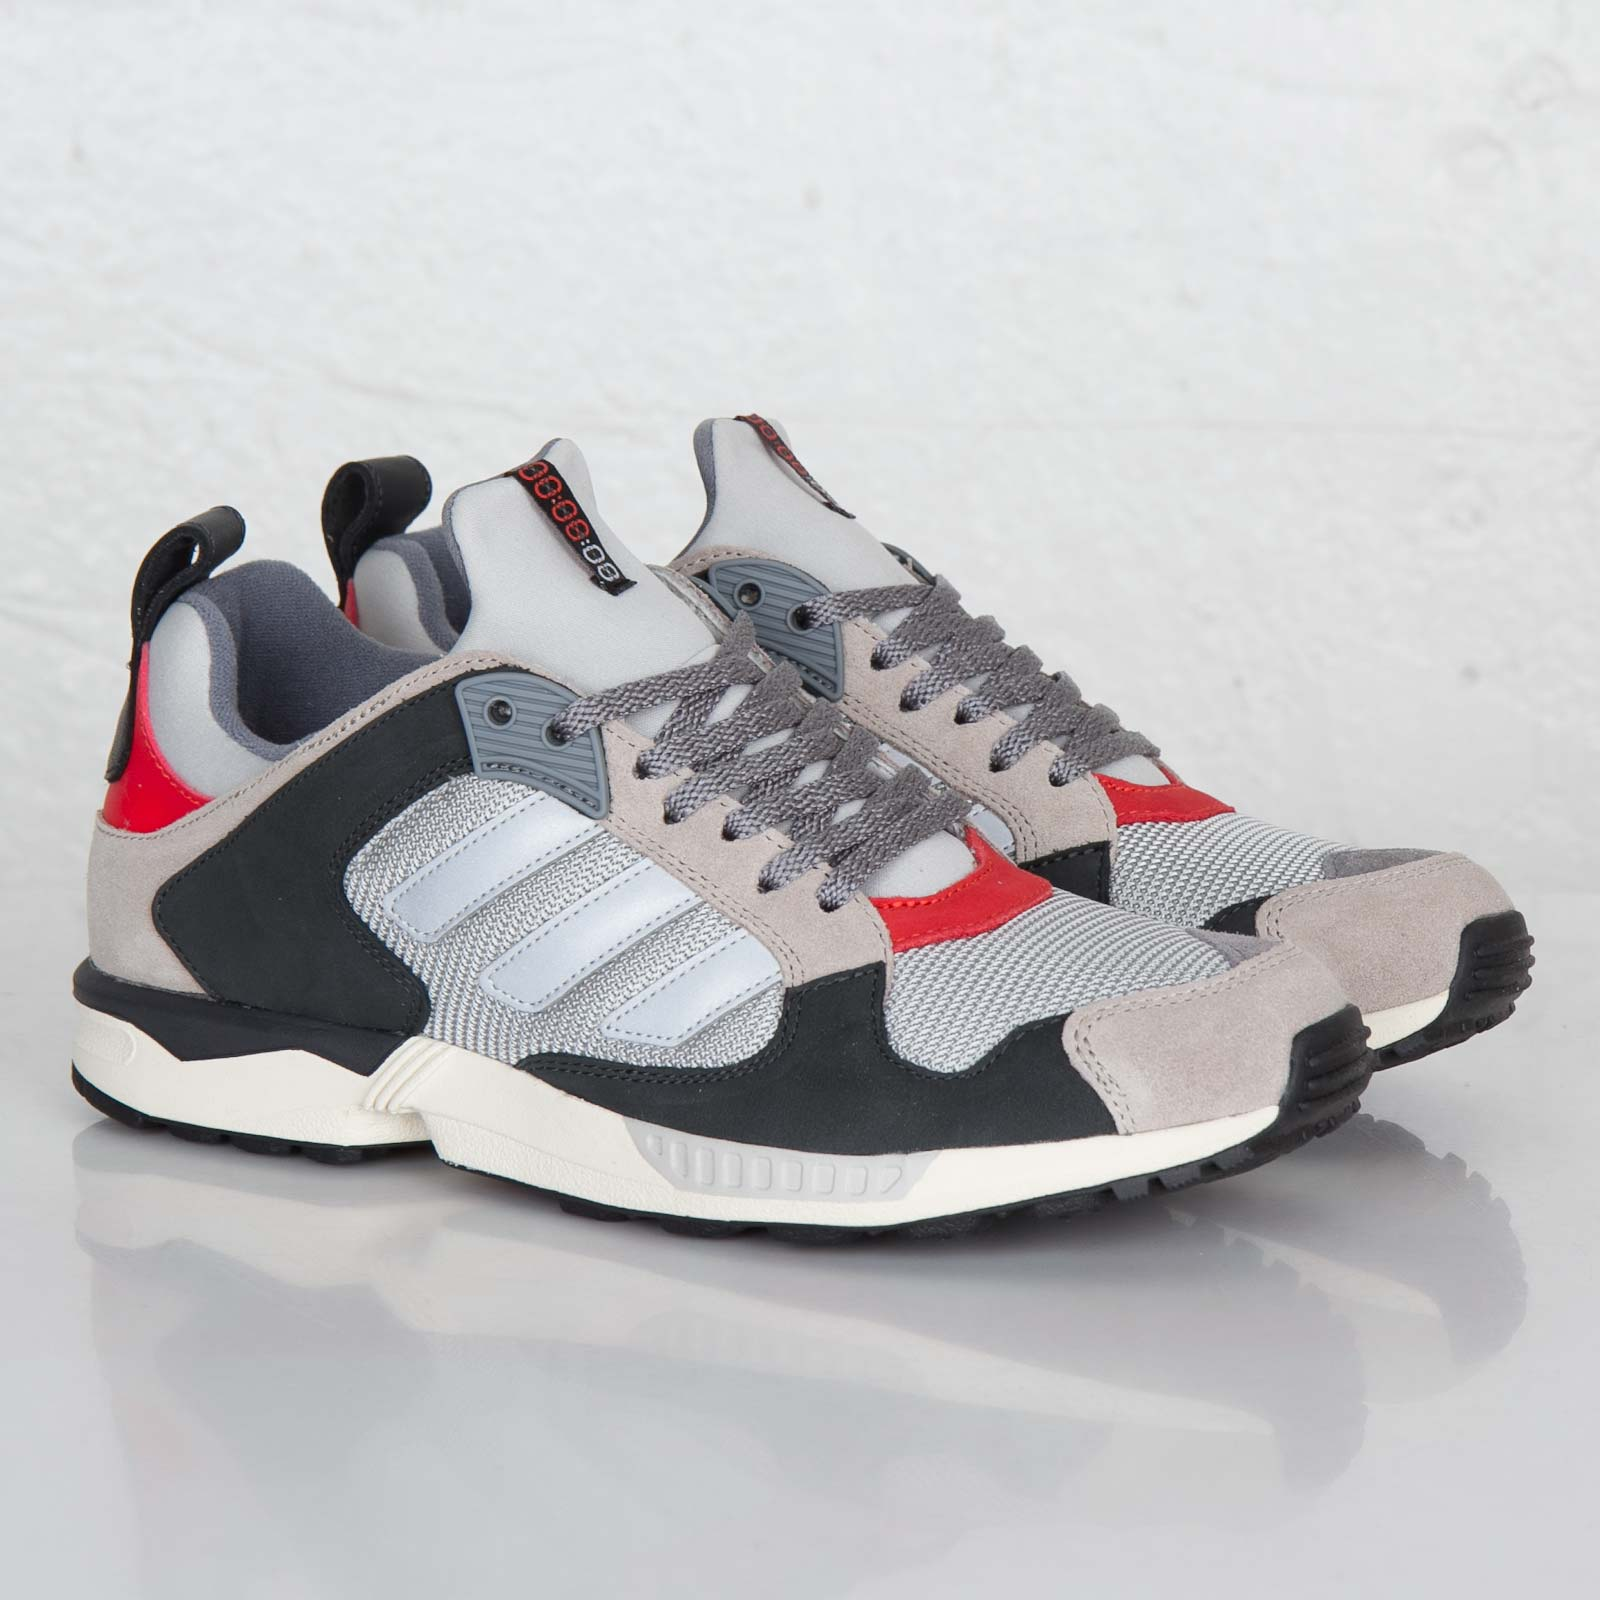 4e64051541f9 adidas ZX5000 RSPN 80/90/00 - D67352 - Sneakersnstuff | sneakers ...